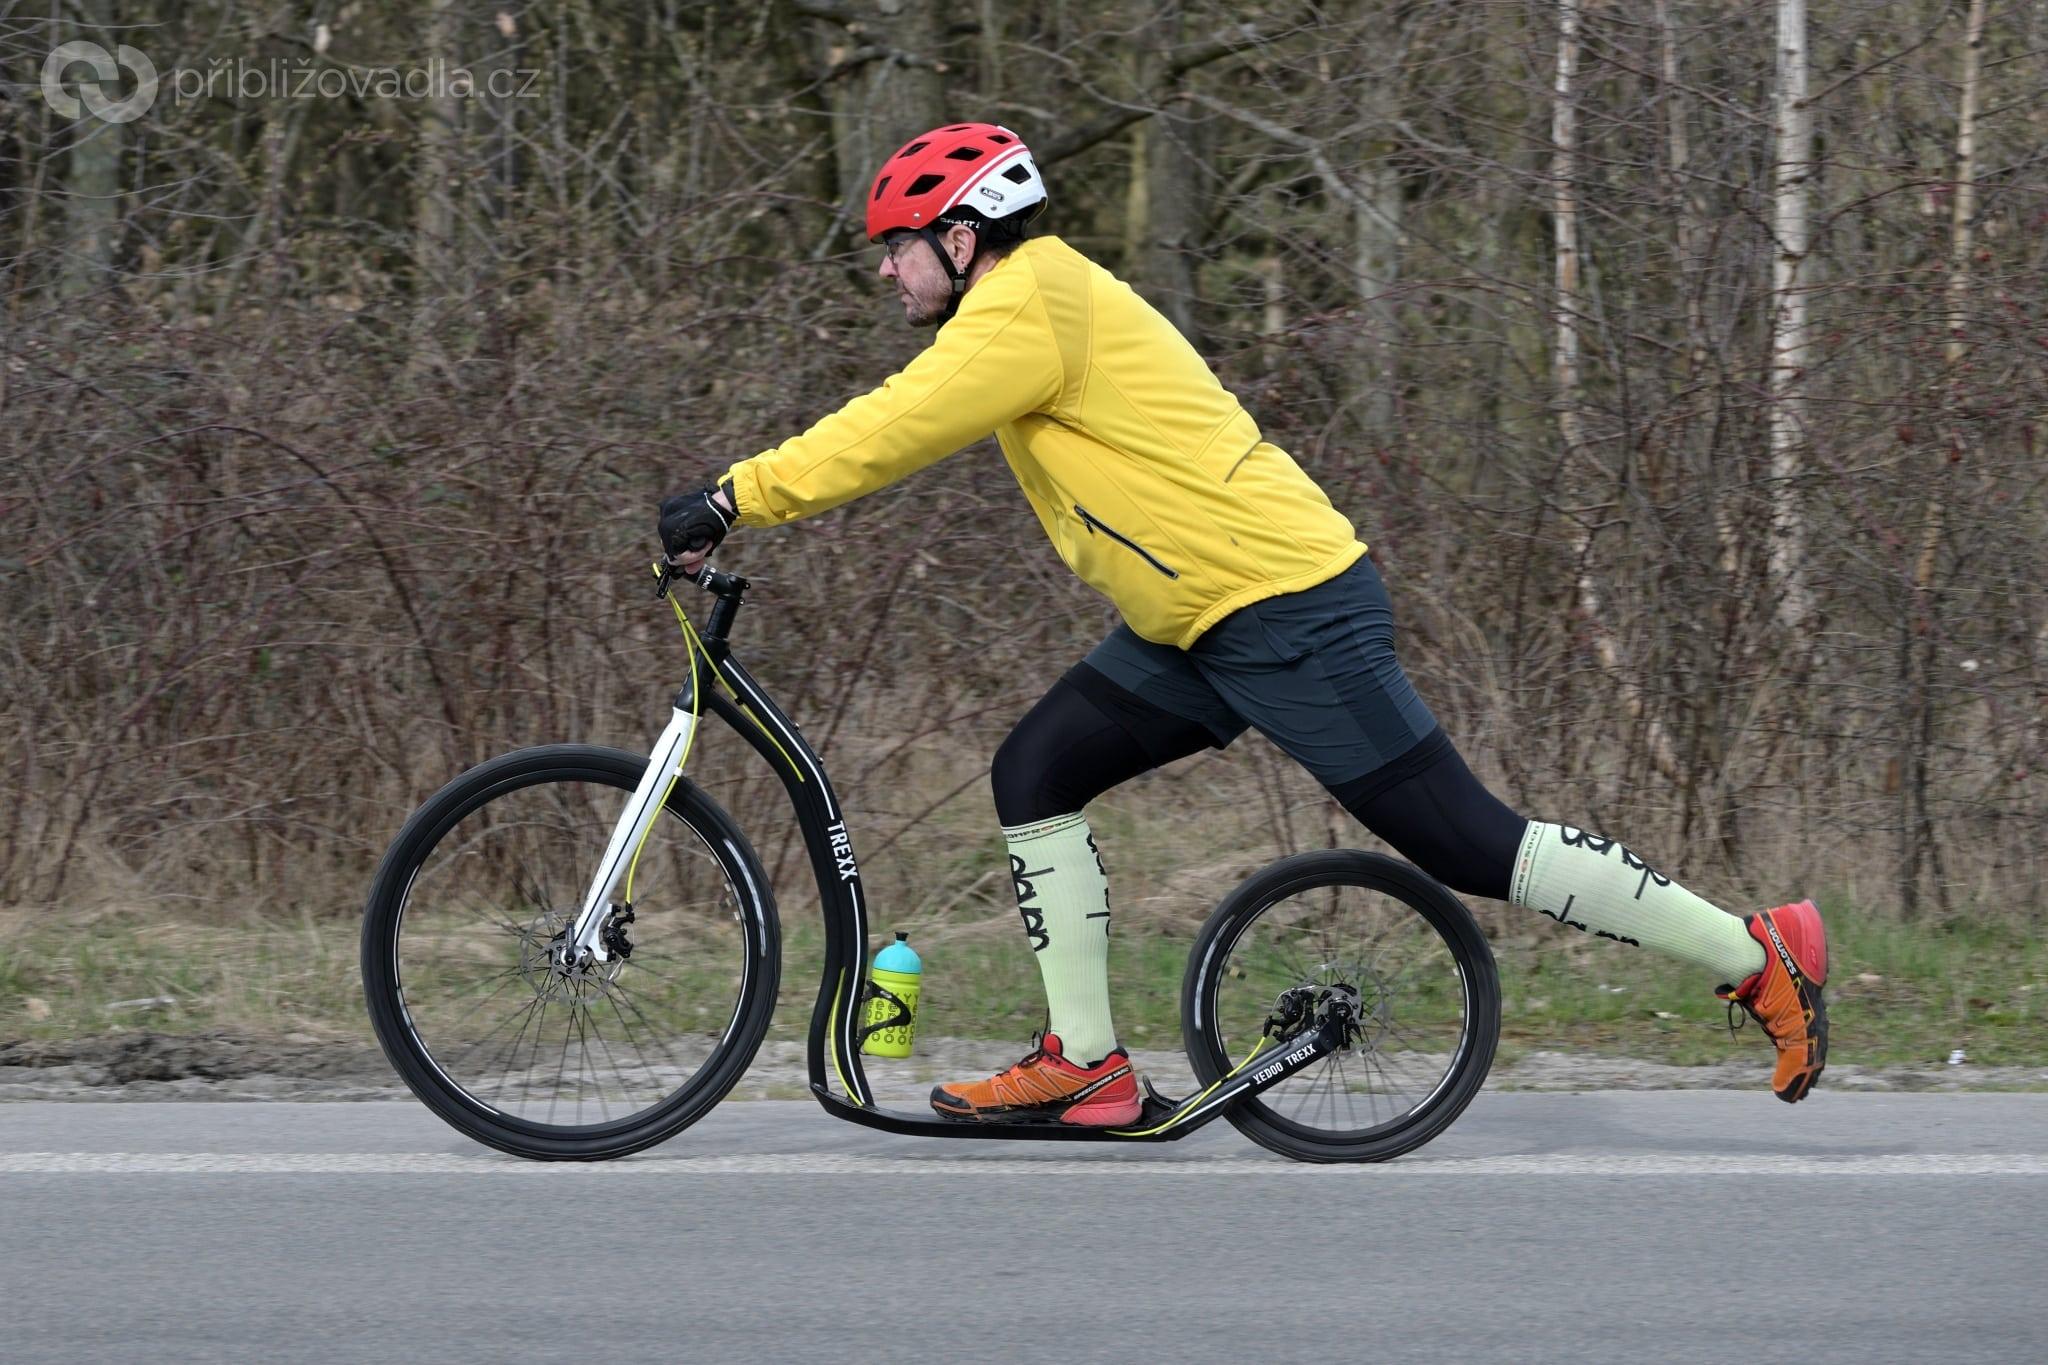 Yedoo Trexx Disc, obutý na pláštích Kenda Kwick Roller Sport, jede jako pila!